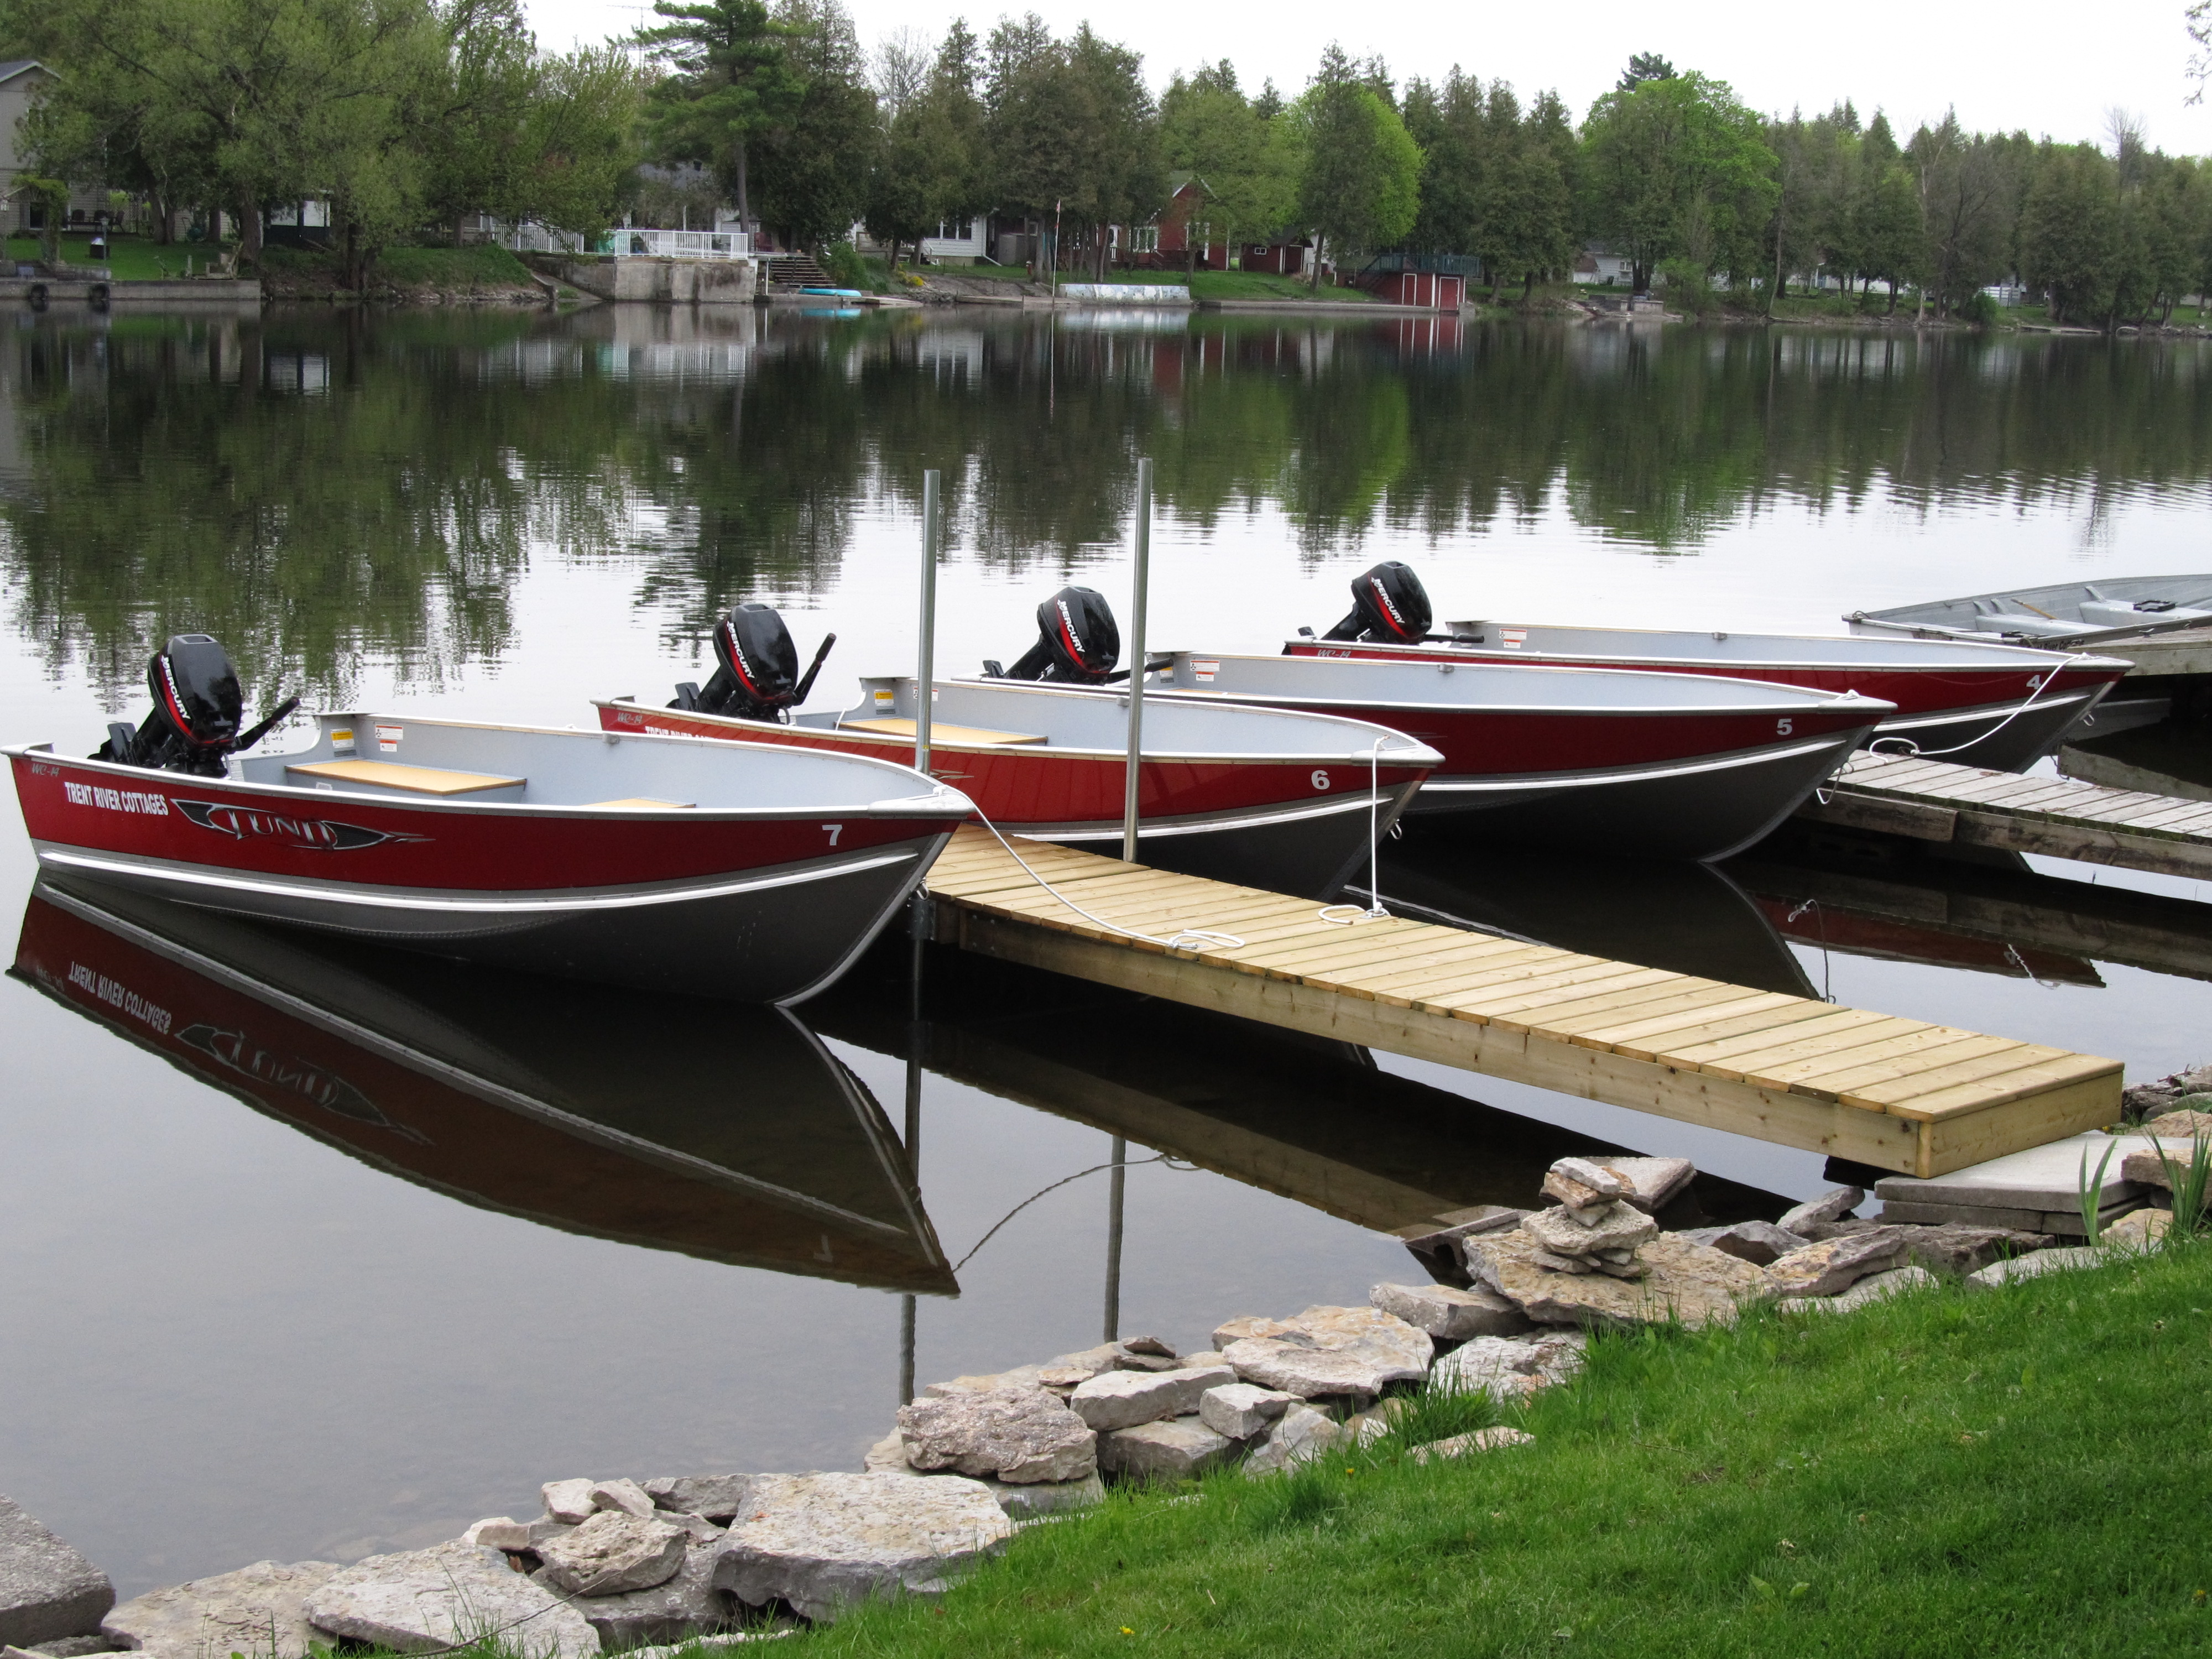 Boats at Ready